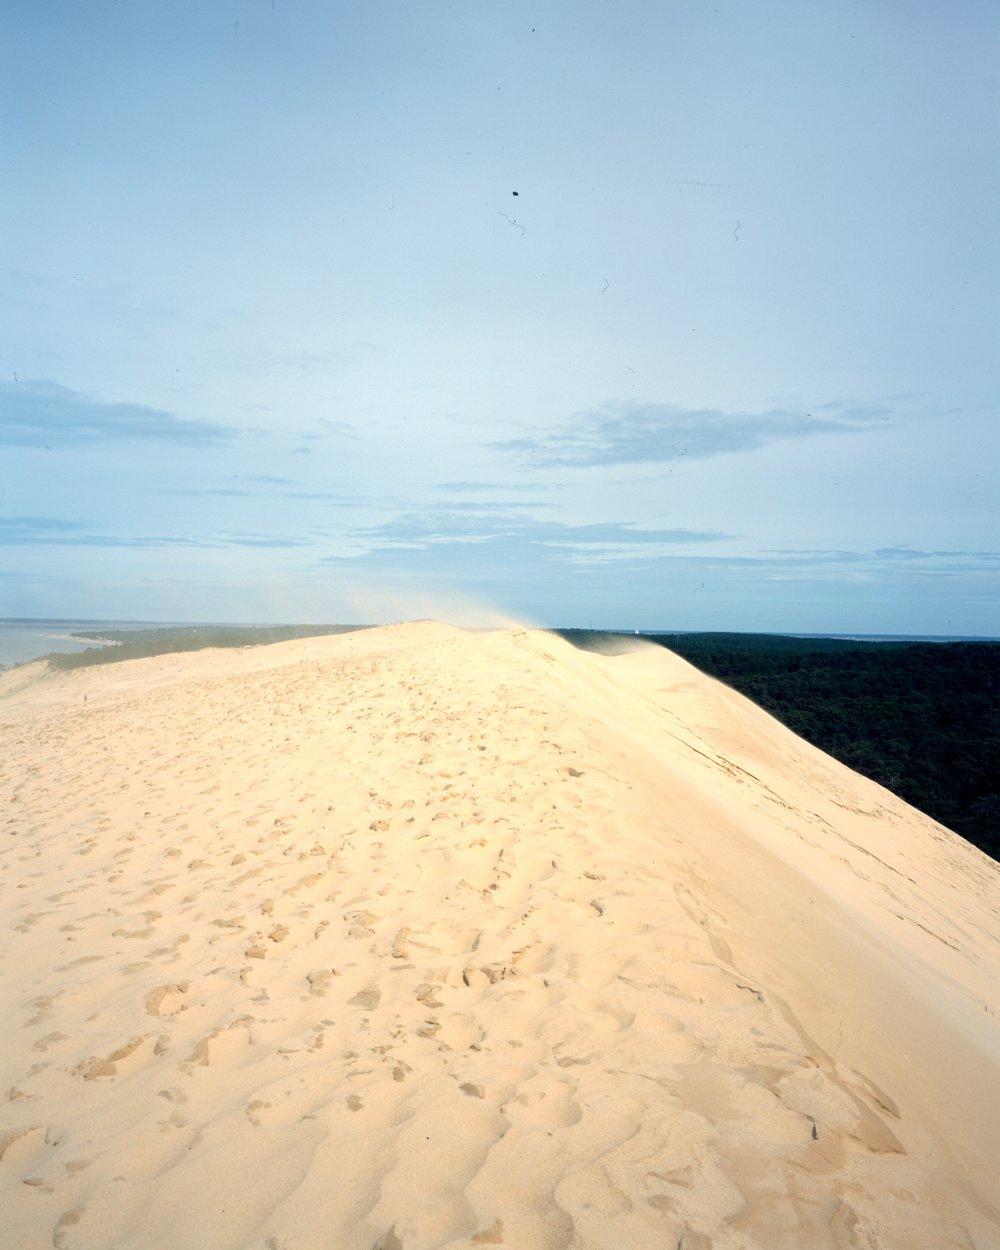 dune du pilat april18 - 003.jpeg